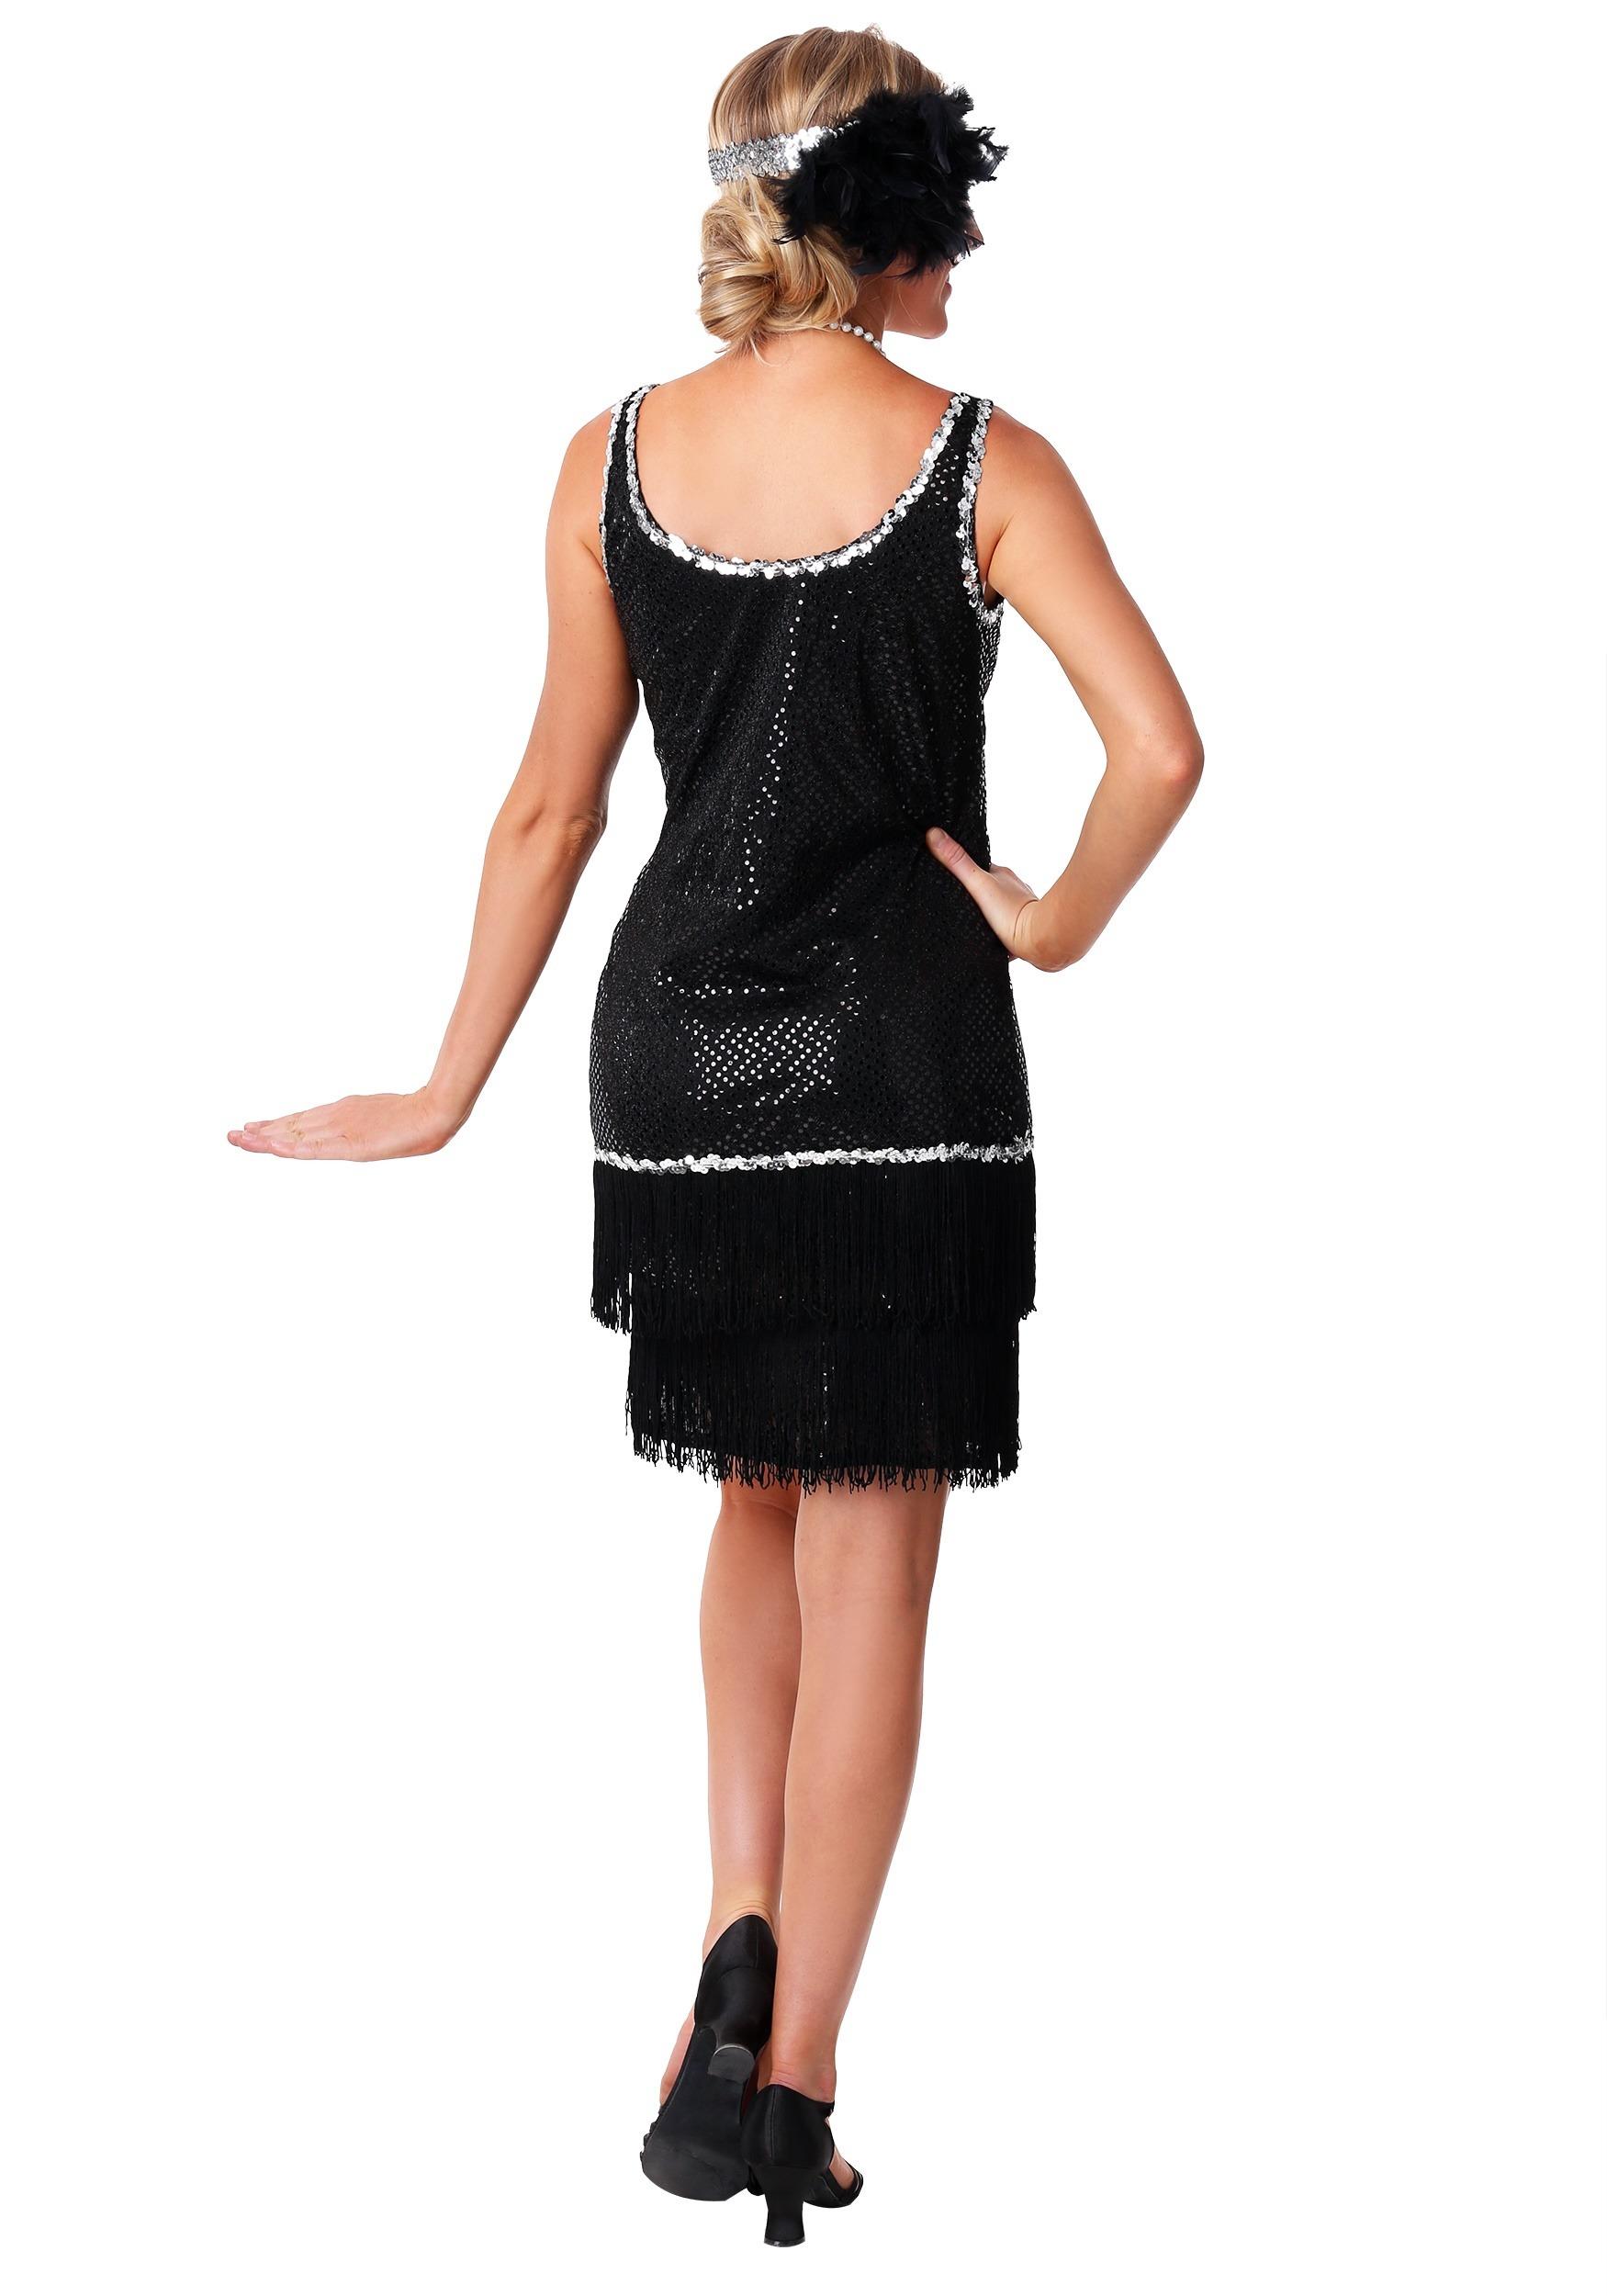 Black Sequin & Fringe Plus Size Flapper Dress Costume